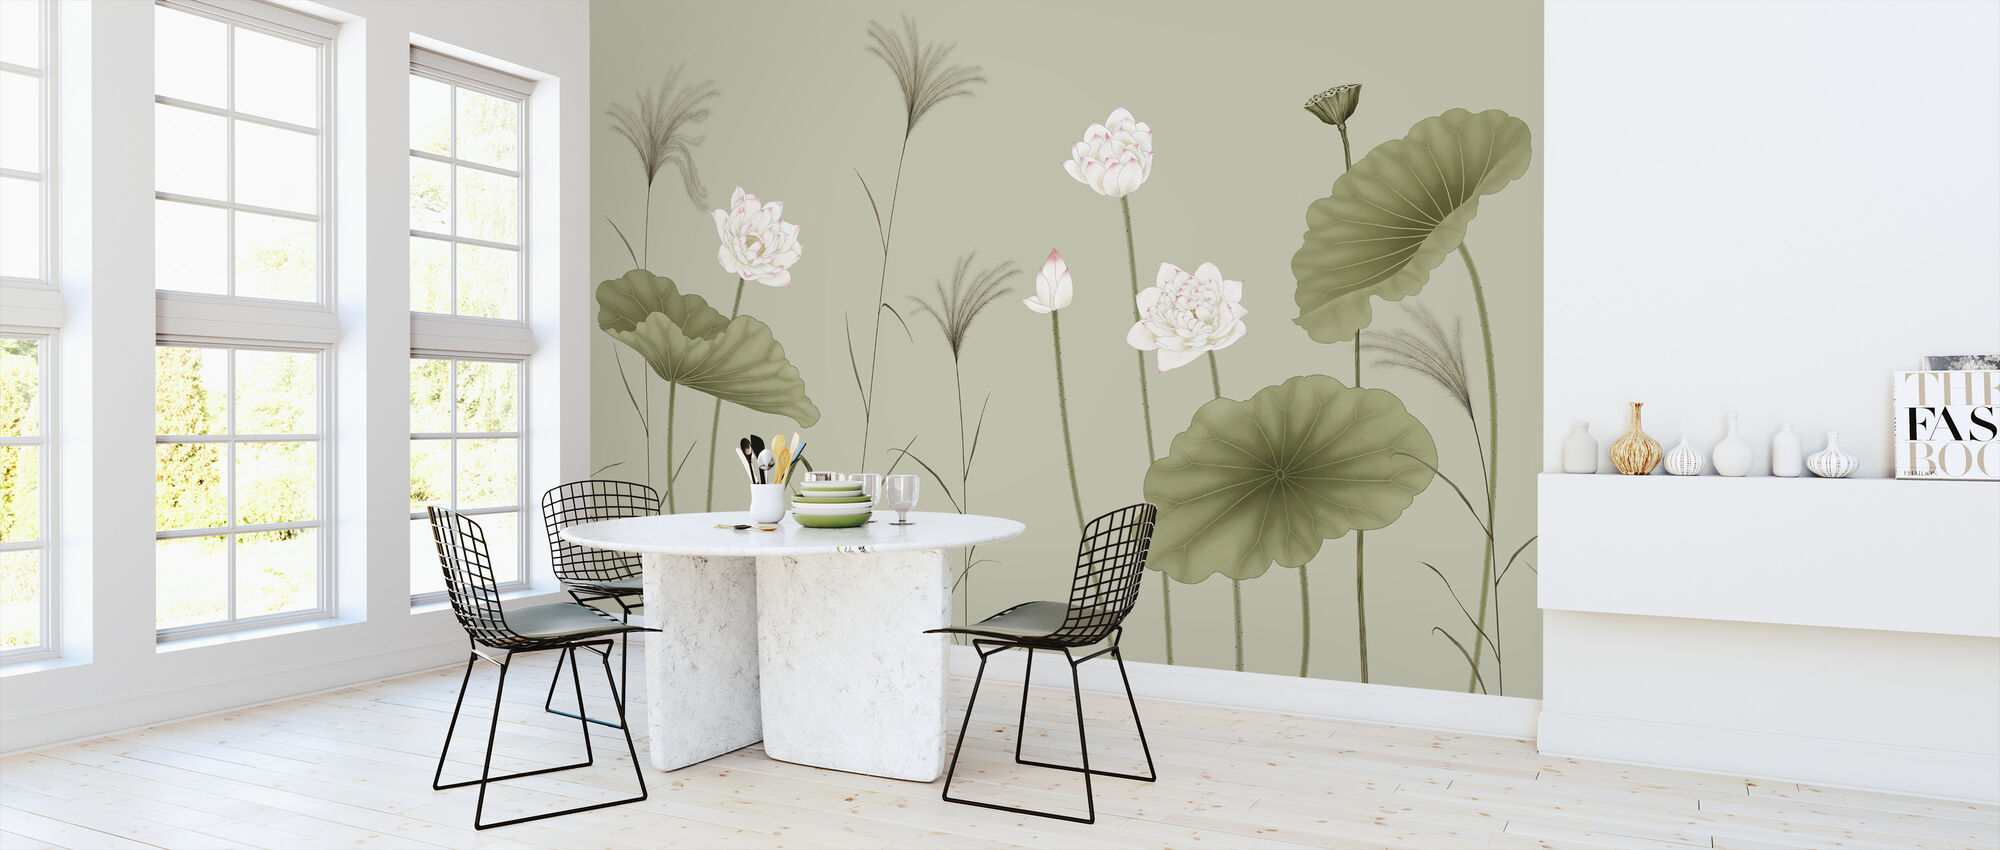 Let It Grow - Pea - Wallpaper - Kitchen